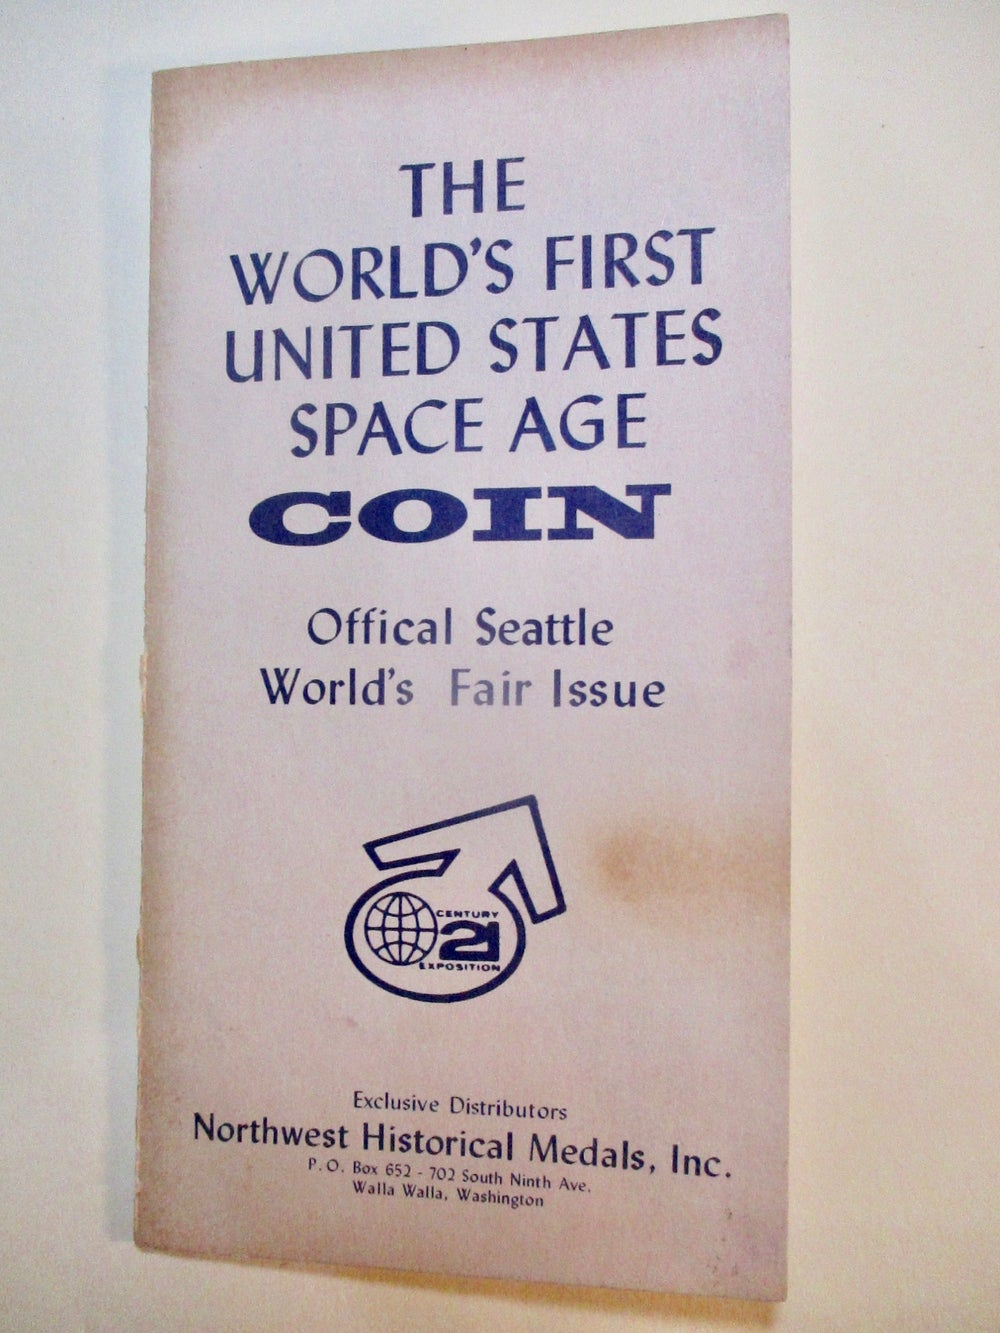 1962 C21-Original 1962 Folder with a Gem Mint Space Age Official Medal